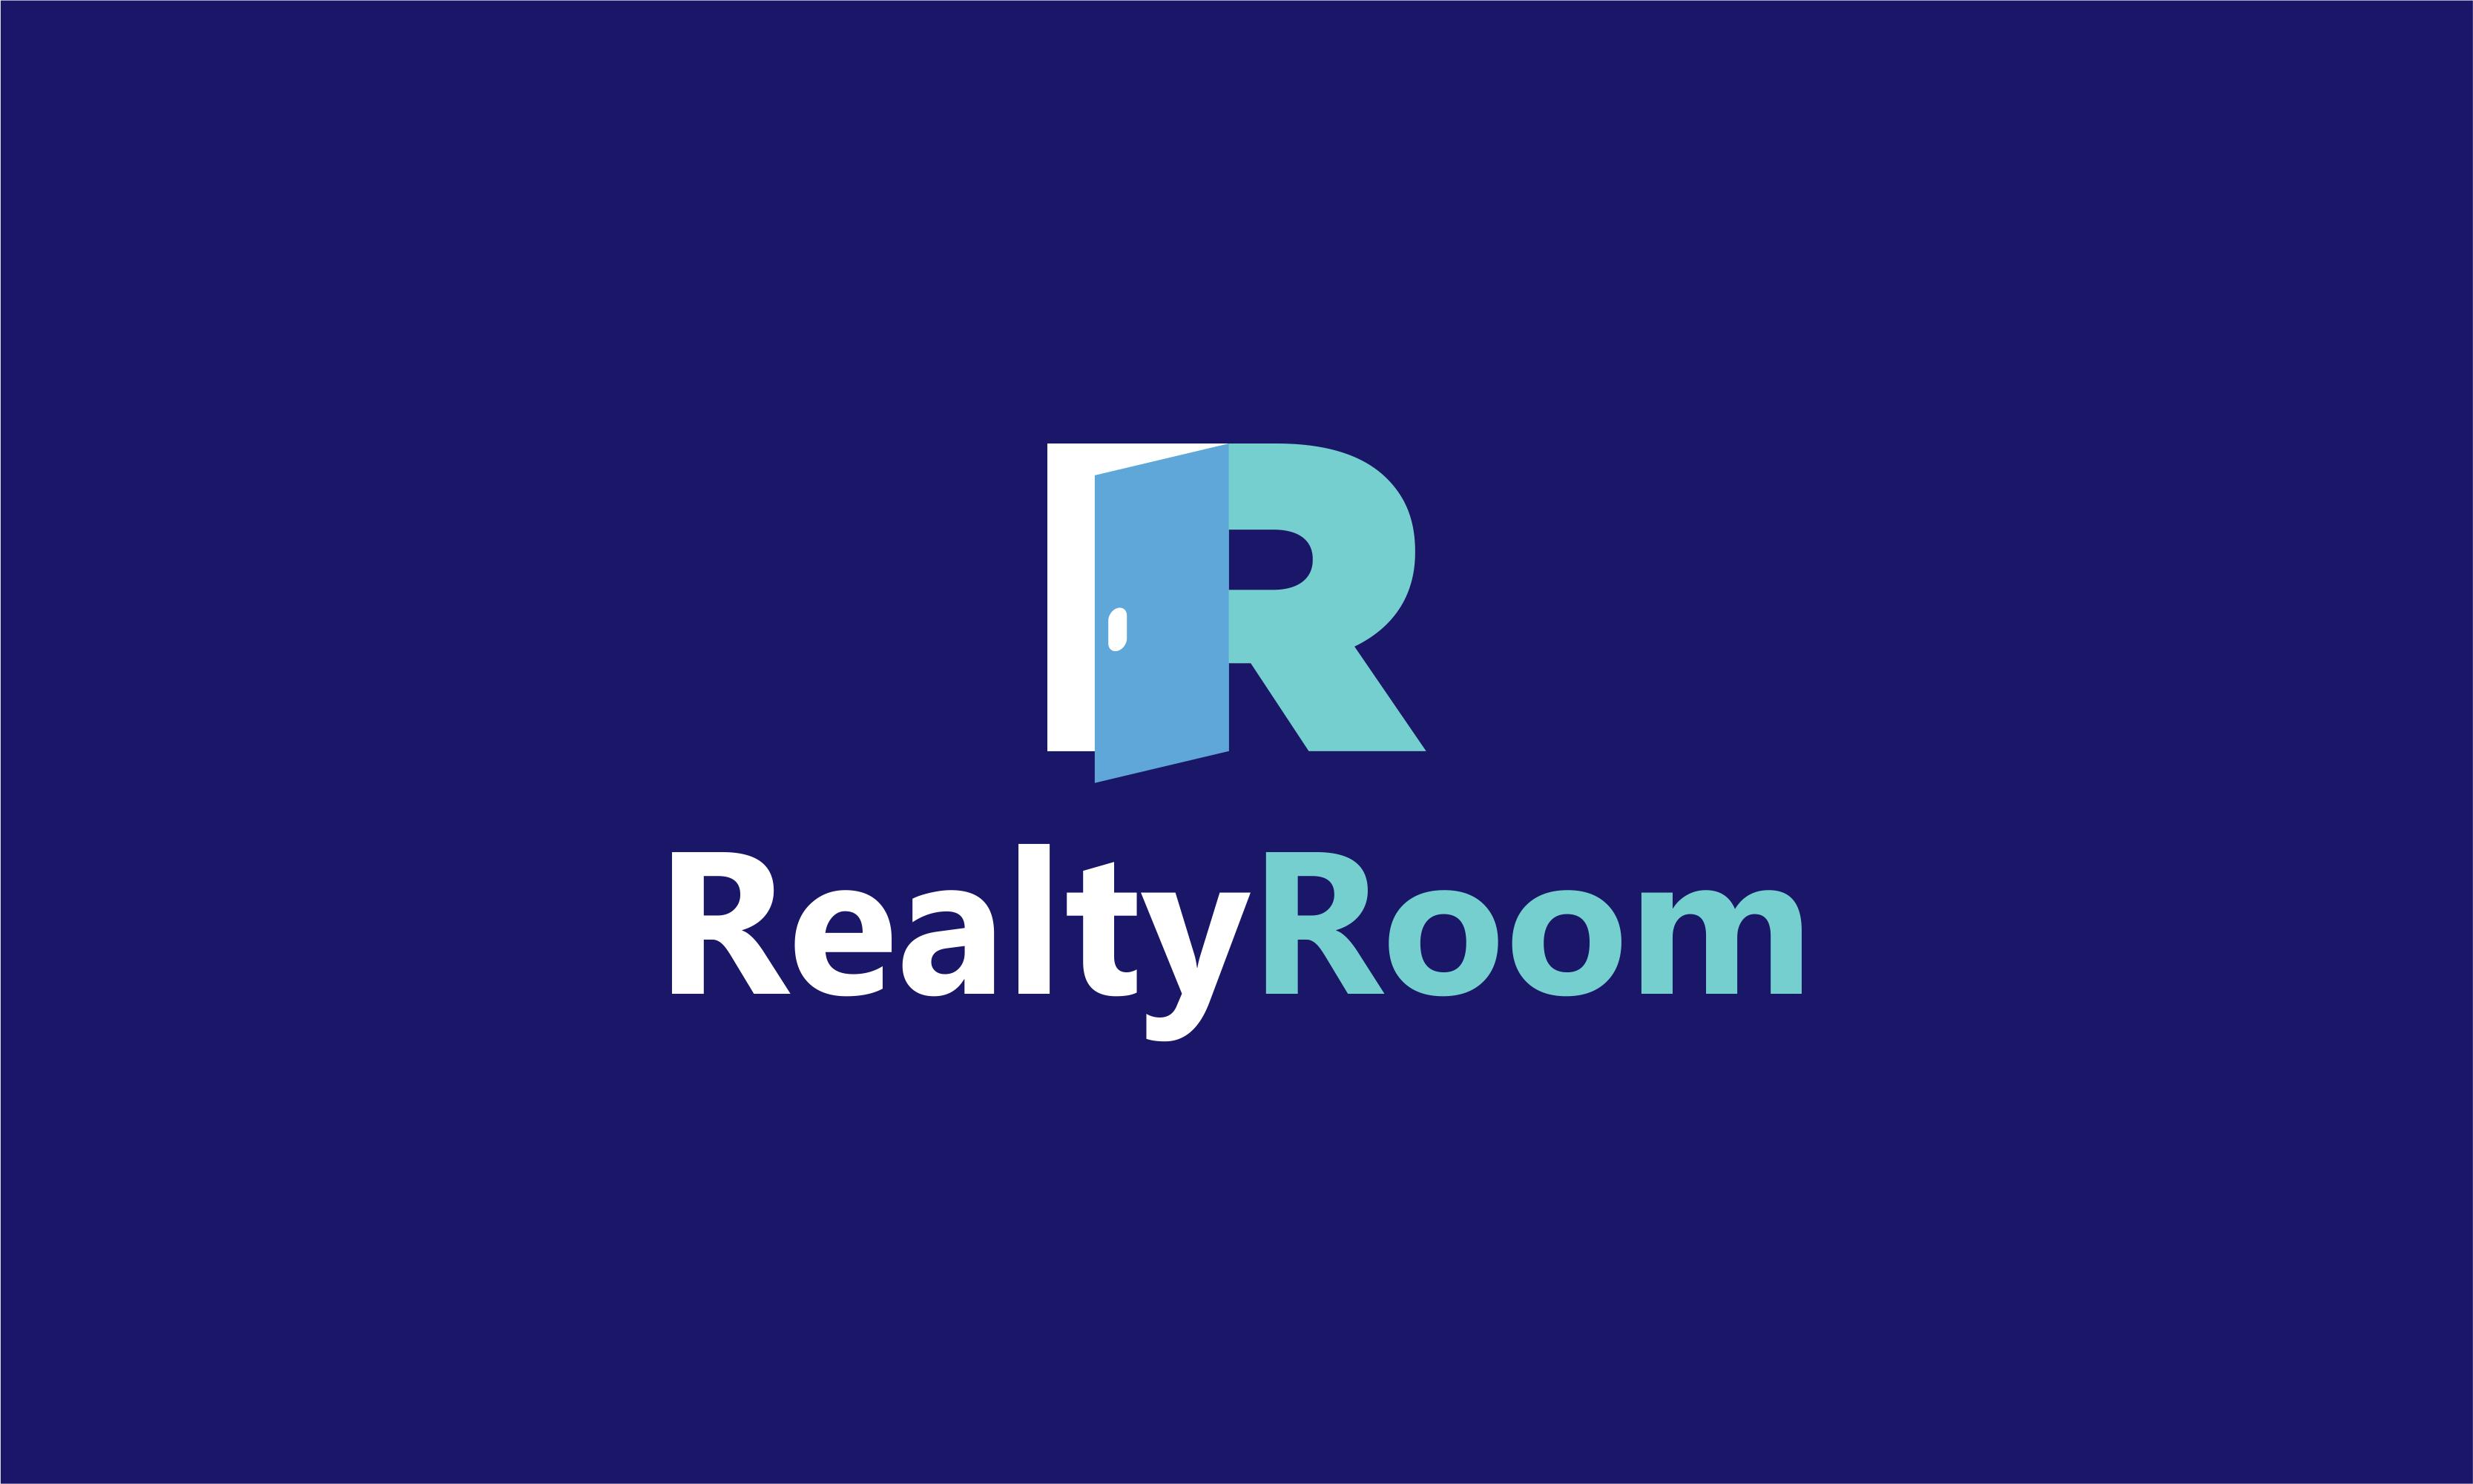 Realtyroom